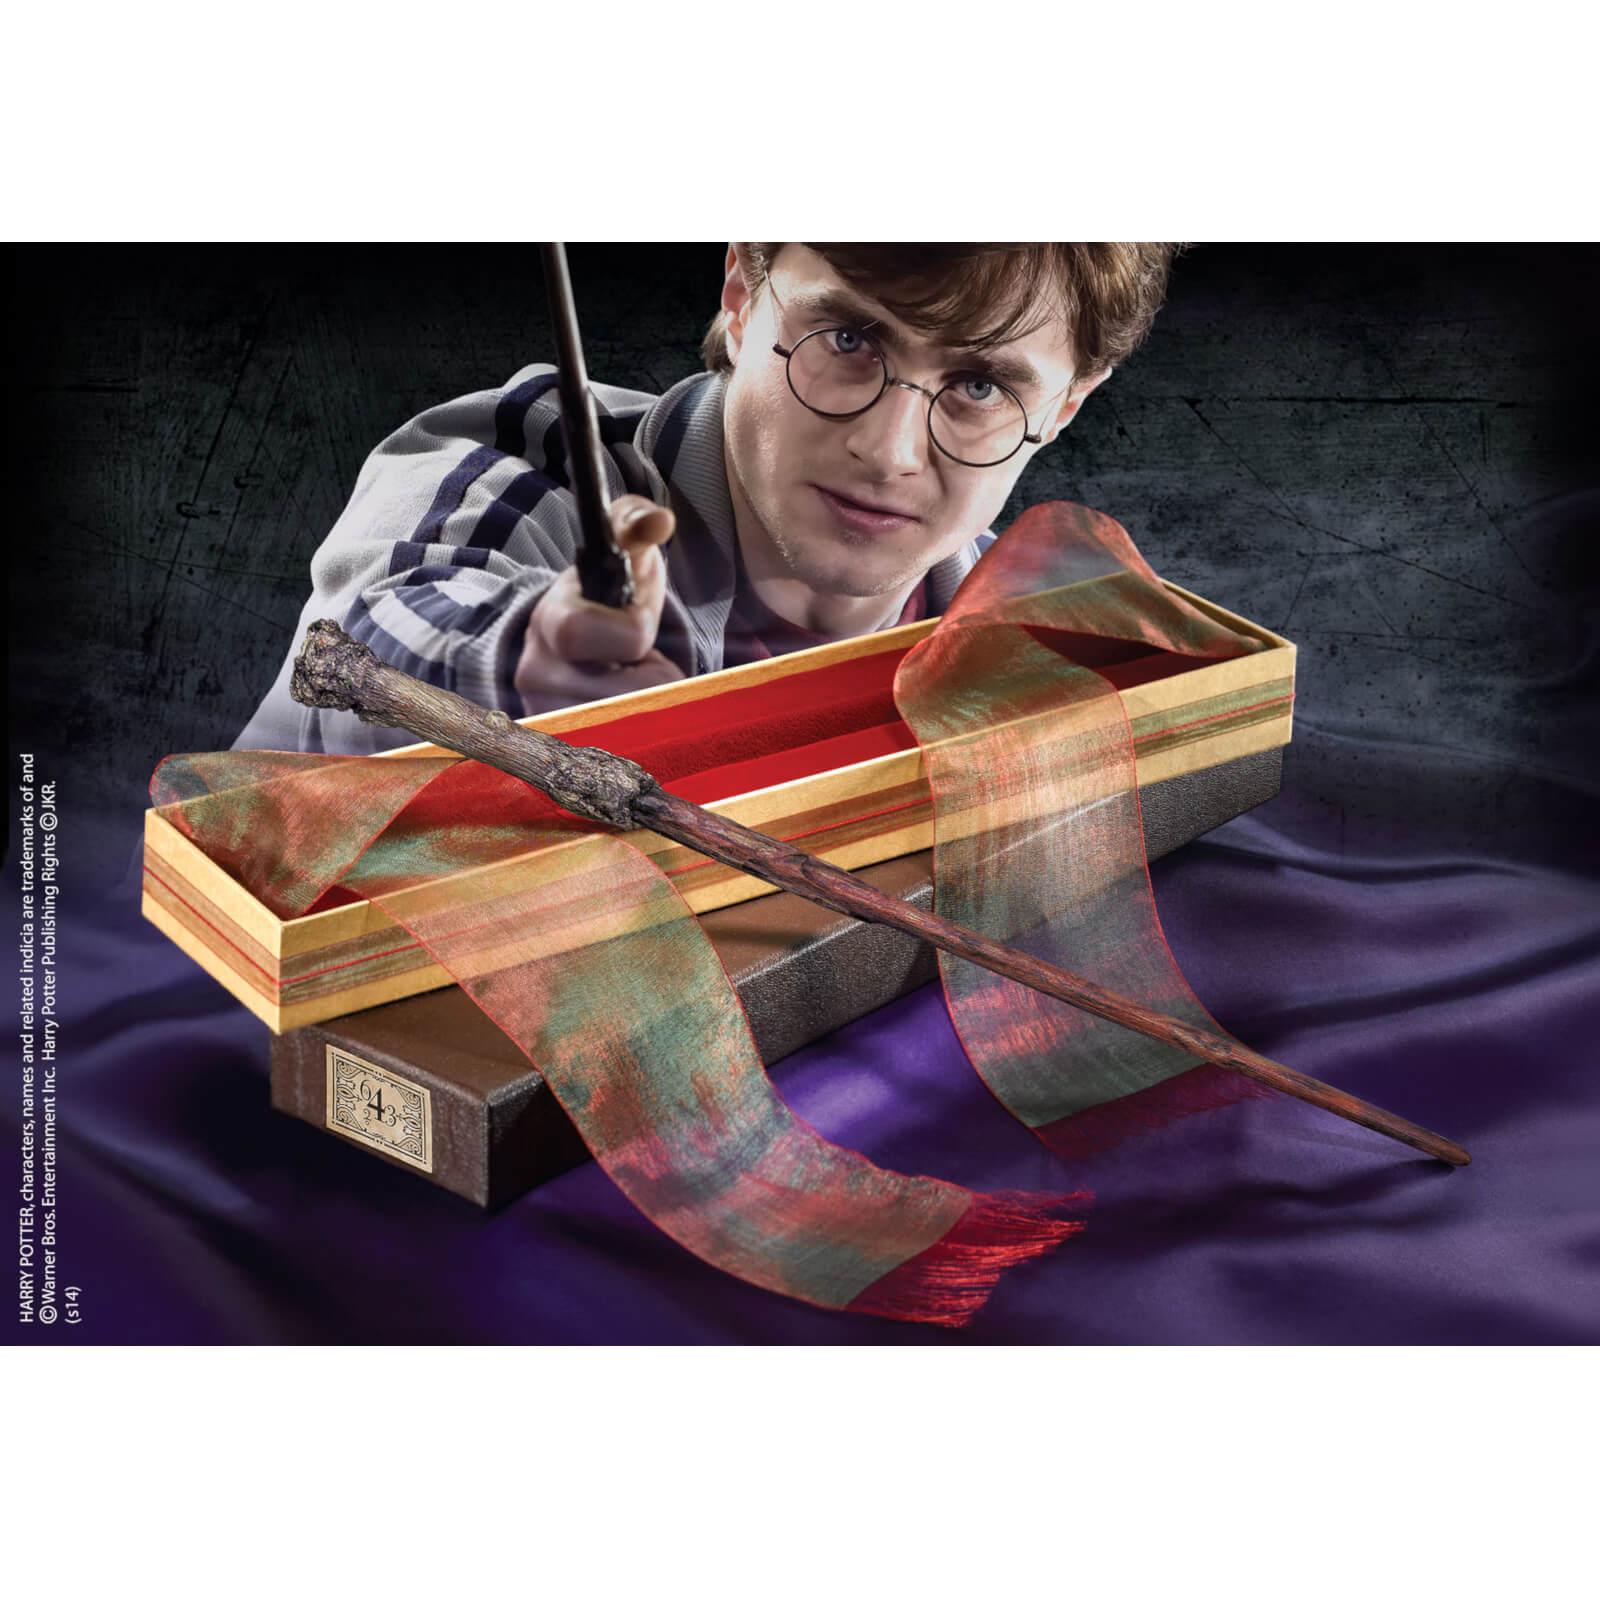 Noble Collection Harry Potter Zauberstab von Harry Potter in Ollivanders Box